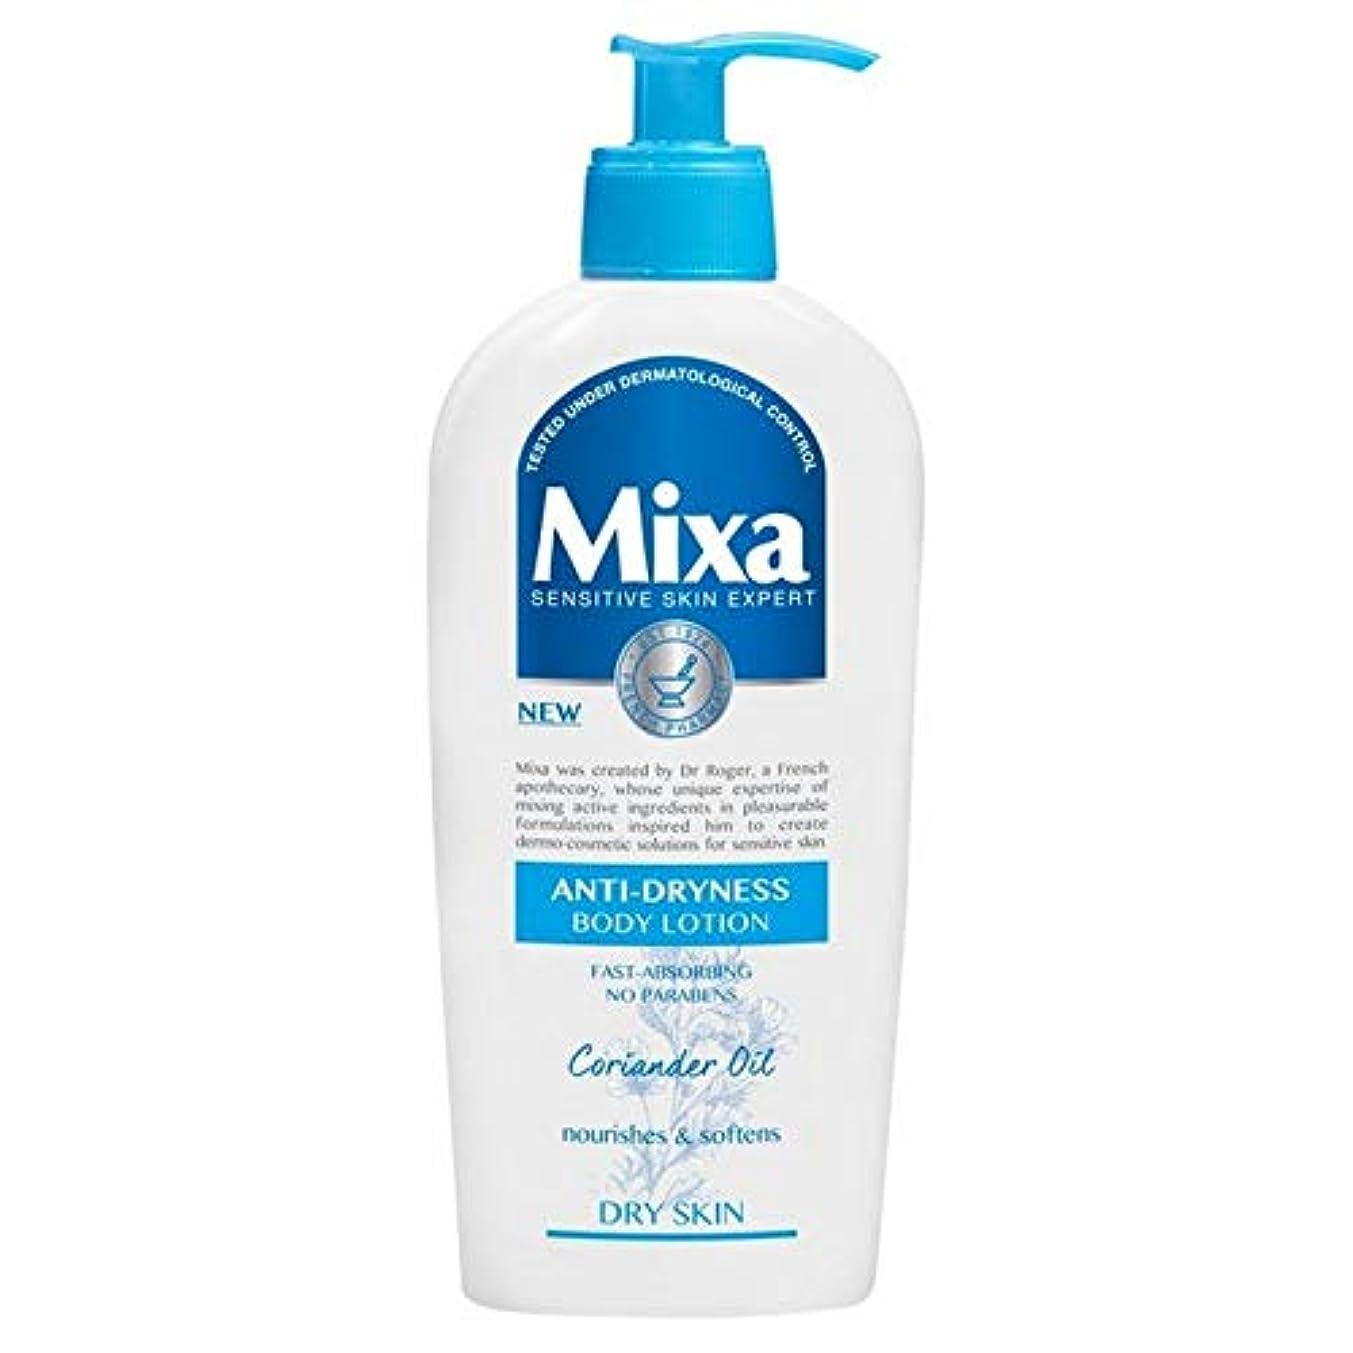 [Mixa] Mixa抗乾燥ボディローション250ミリリットル - Mixa Anti-Dryness Body Lotion 250ml [並行輸入品]